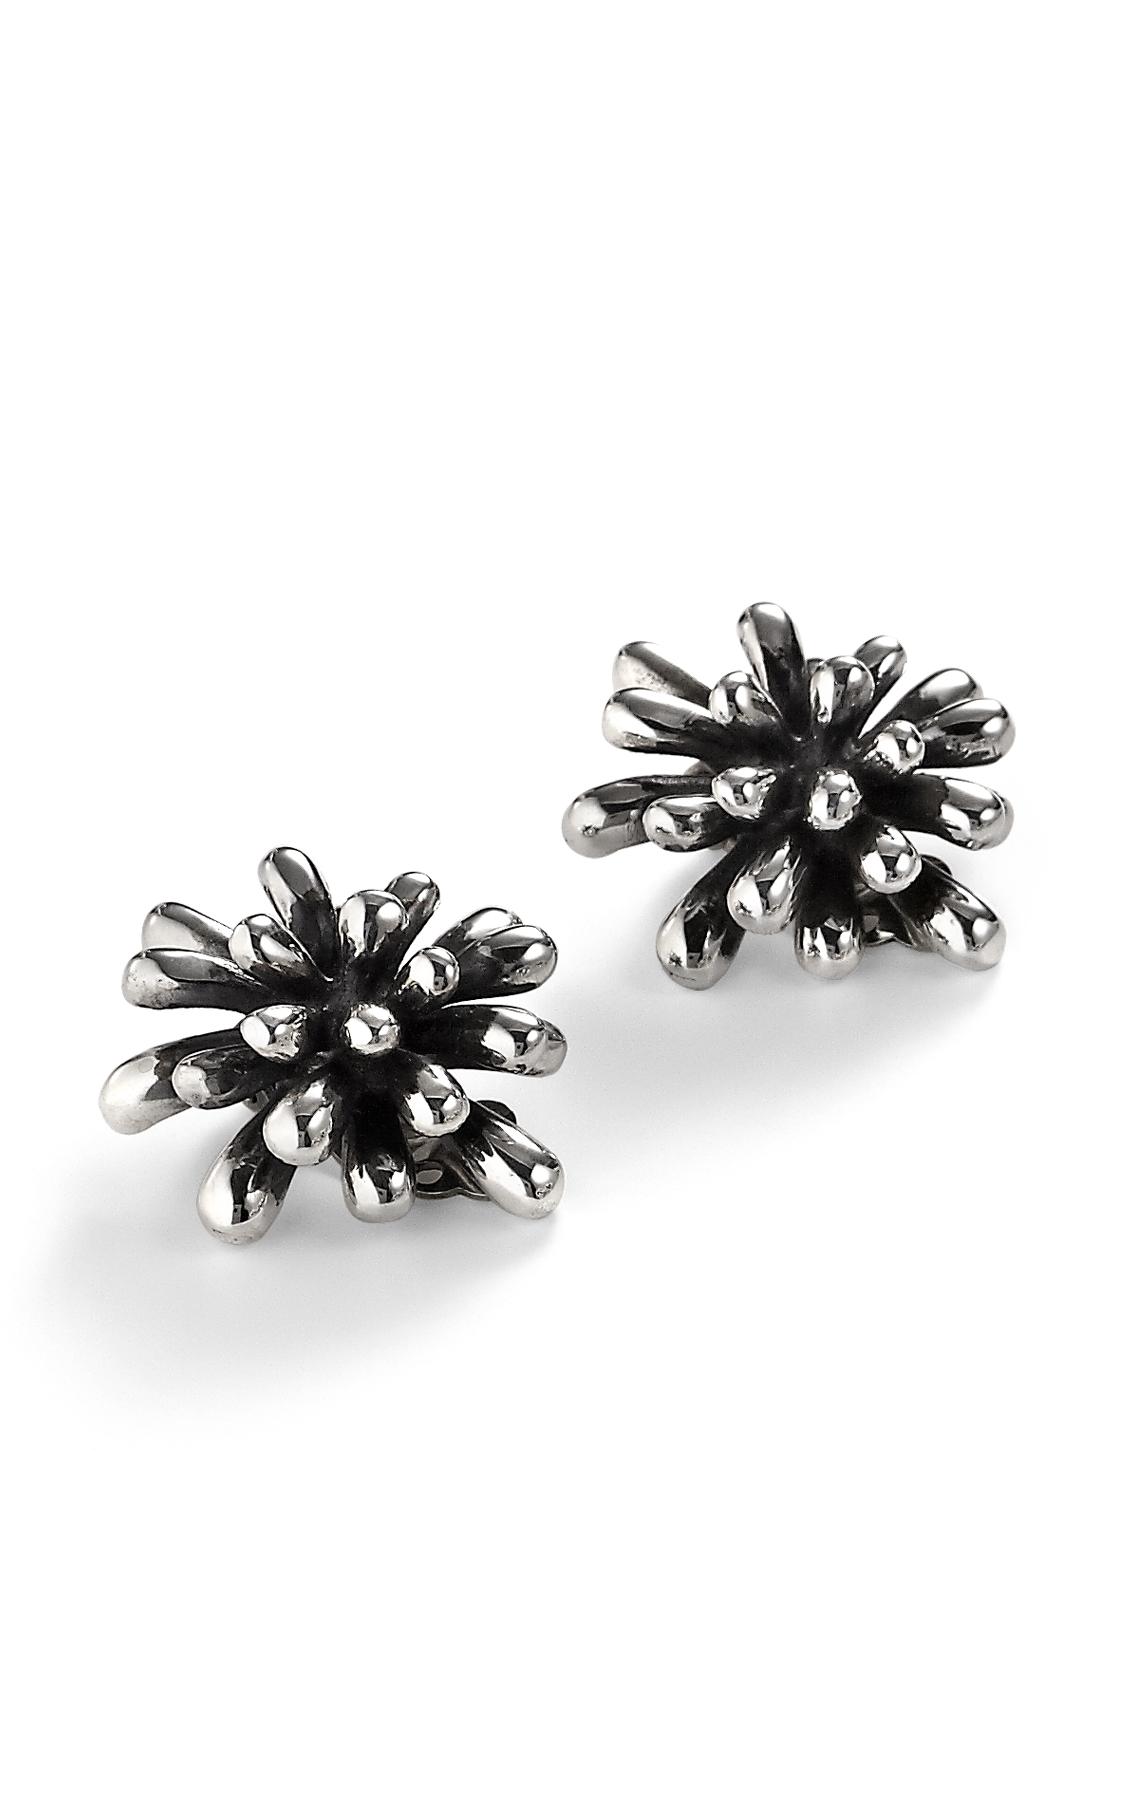 Zina Windows and Fireworks Earrings B487 product image